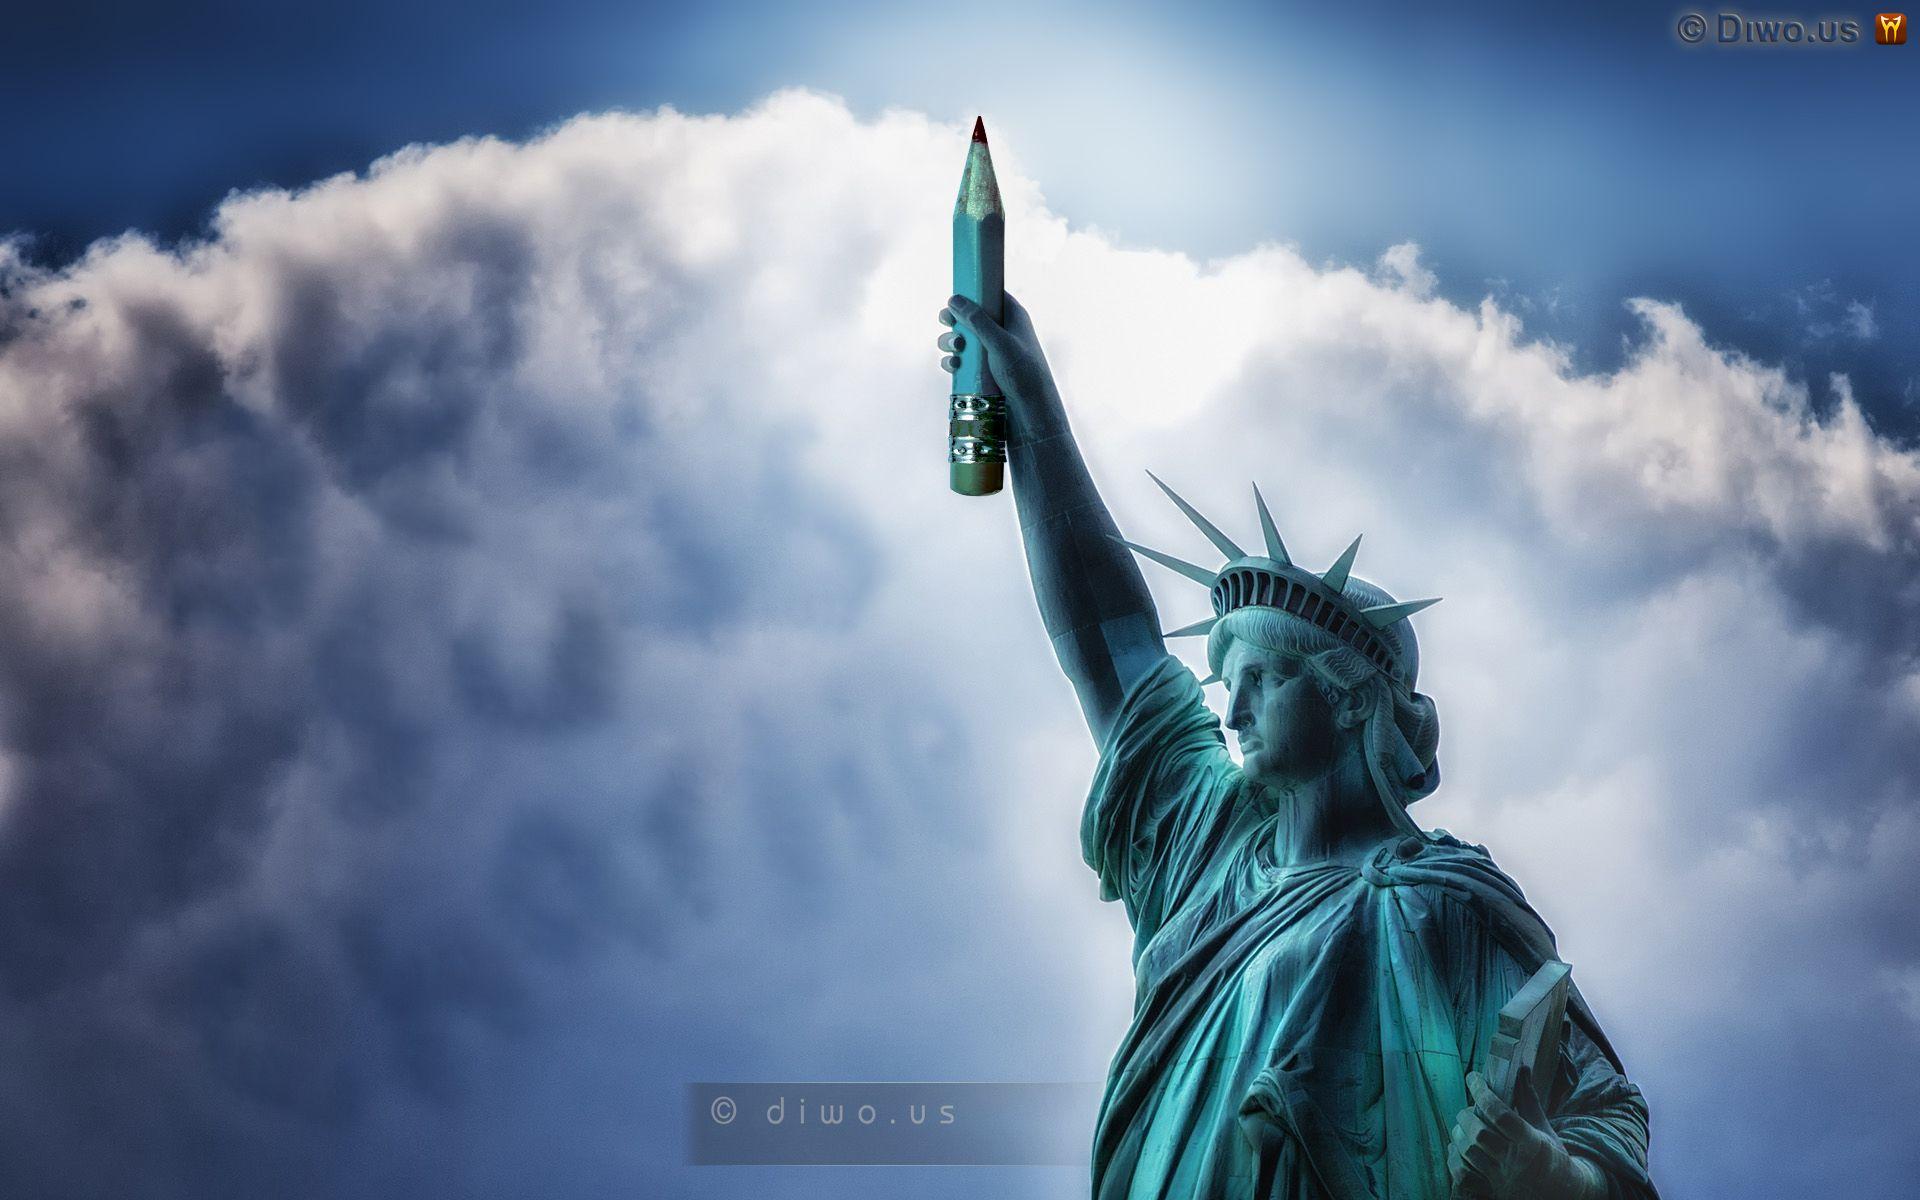 Diwous - Je suis Charlie Hebdo, fotomontáž, humor, Je suis Charlie, karikatura, socha Svobody, tužka, vtip, Statue of Liberty